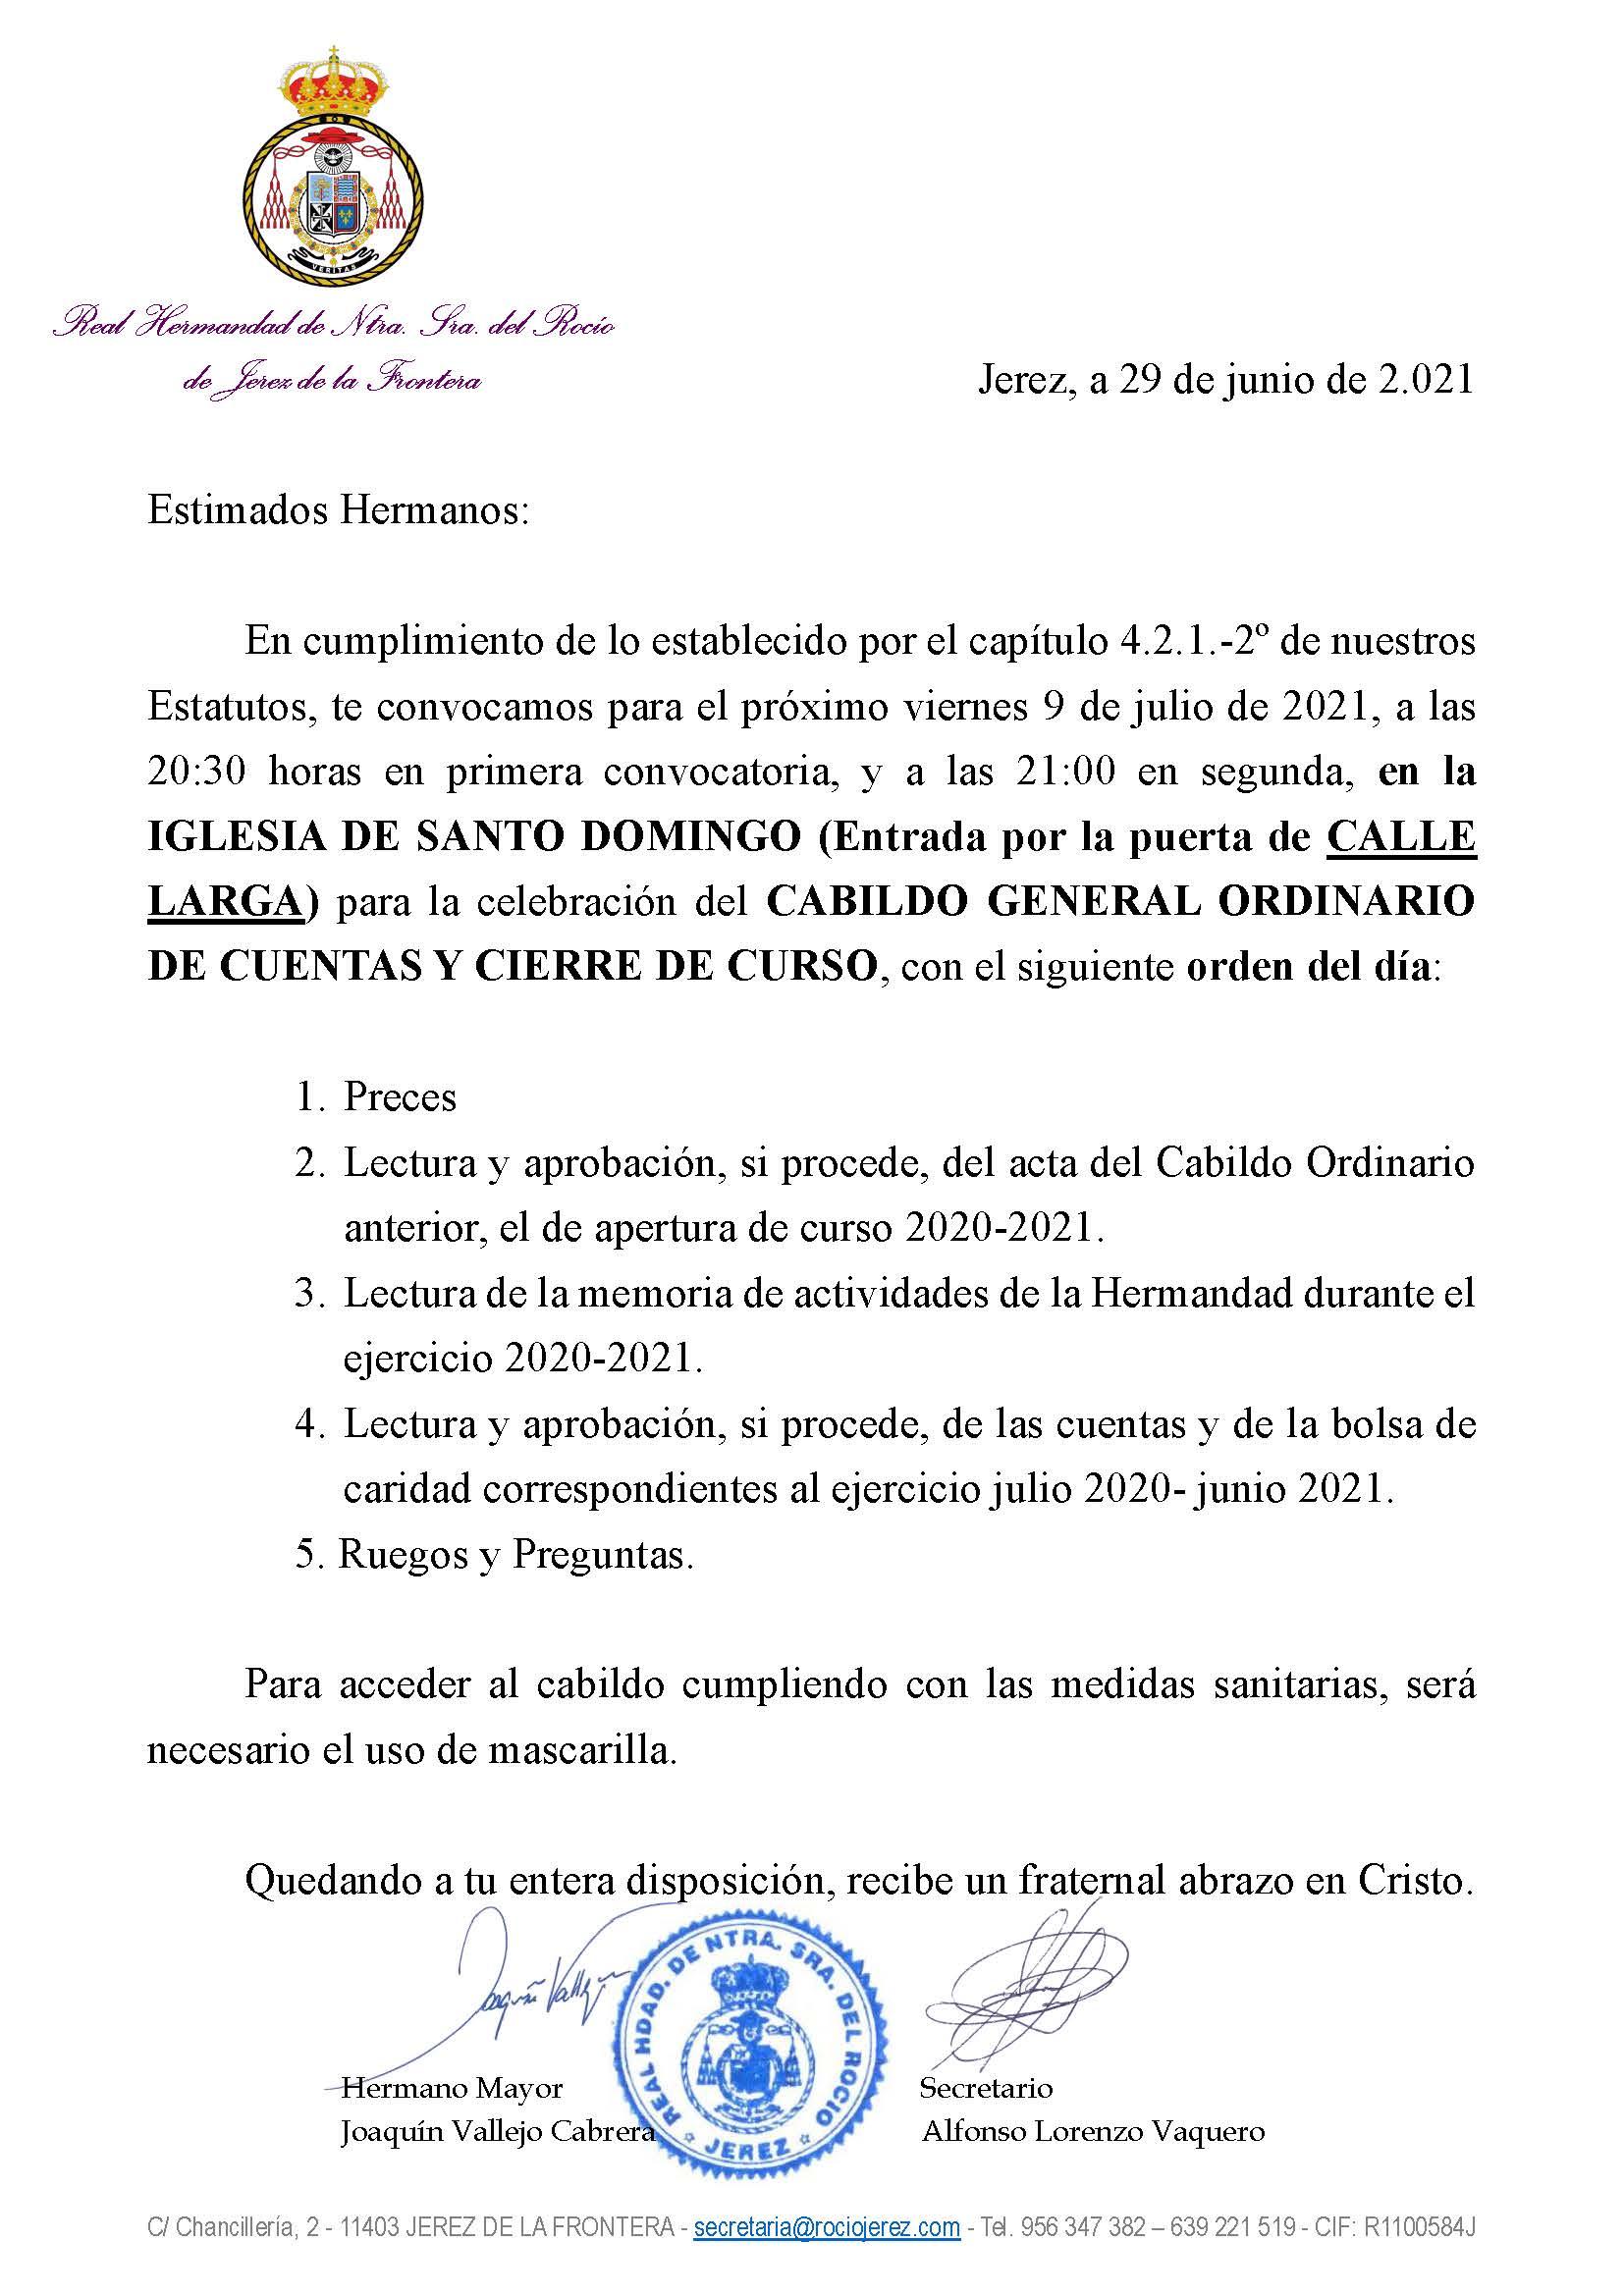 carta-hermanos-cabildo-cuentas-2021_pagina_2.jpg